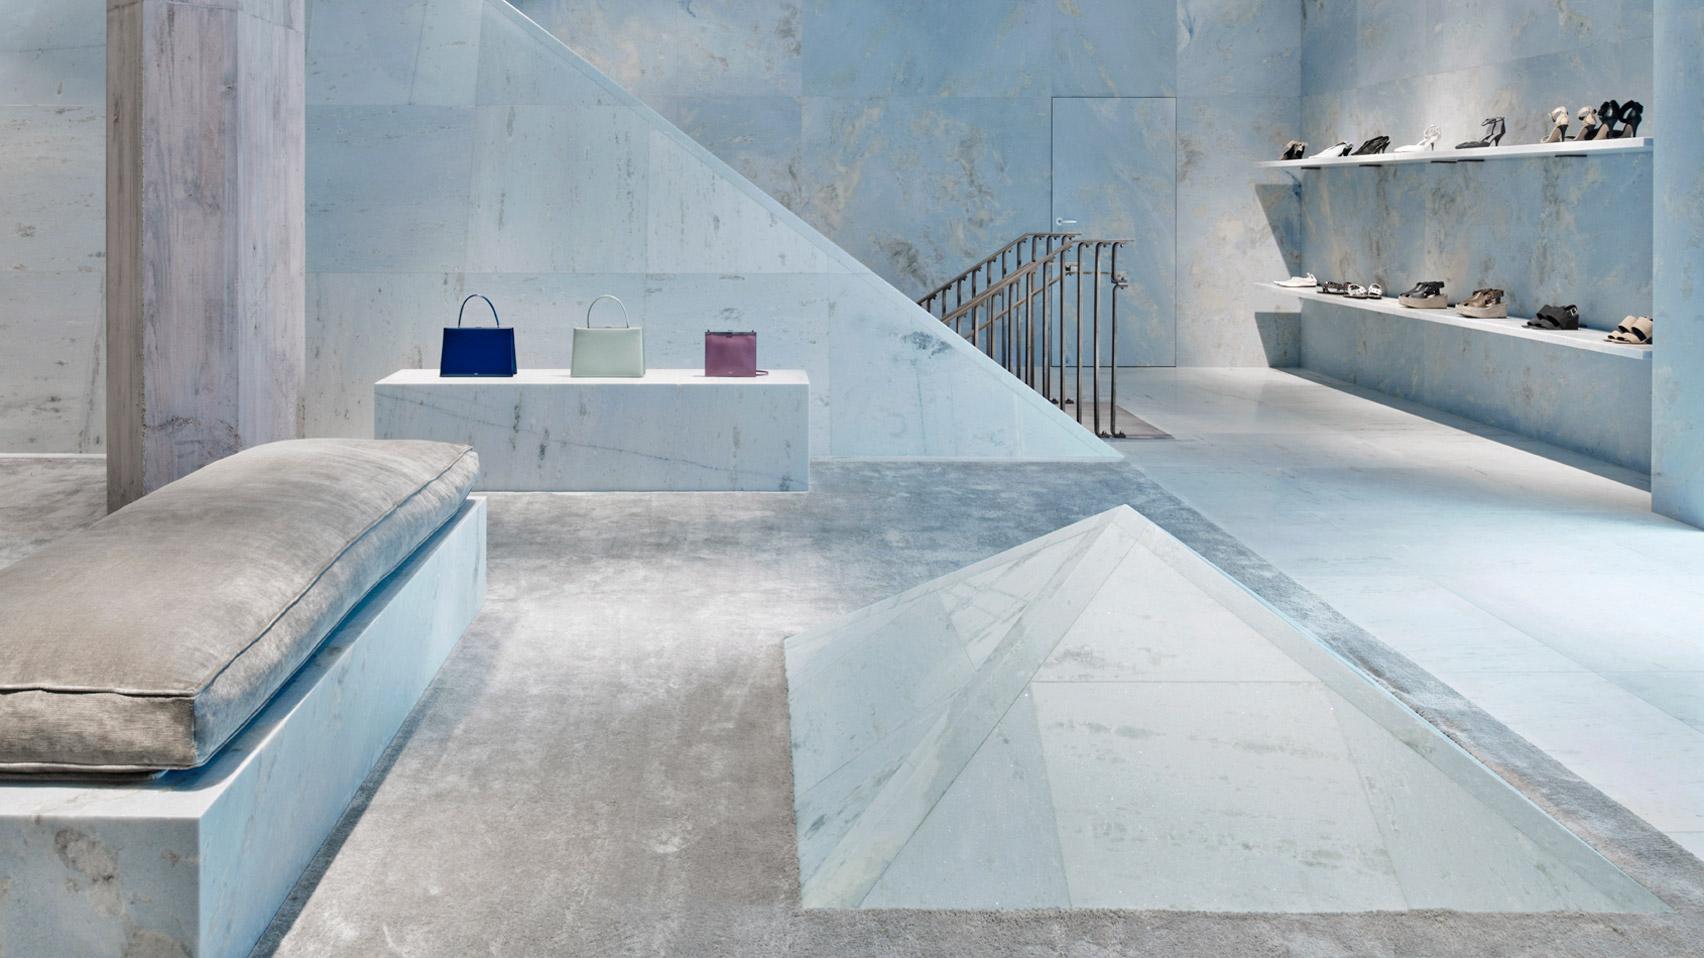 celine-valerio-olgiati-interiors-retail-shops-marble-miami-florida-usa-_dezeen_hero-2